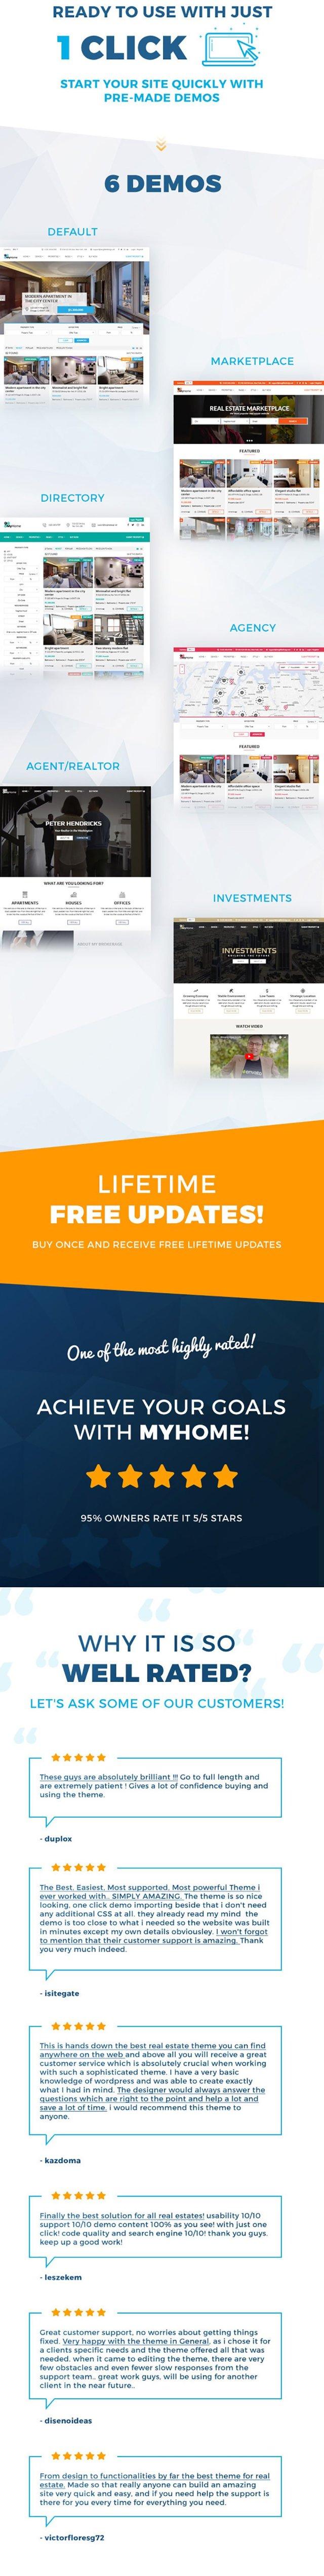 MyHome Real Estate WordPress - 4